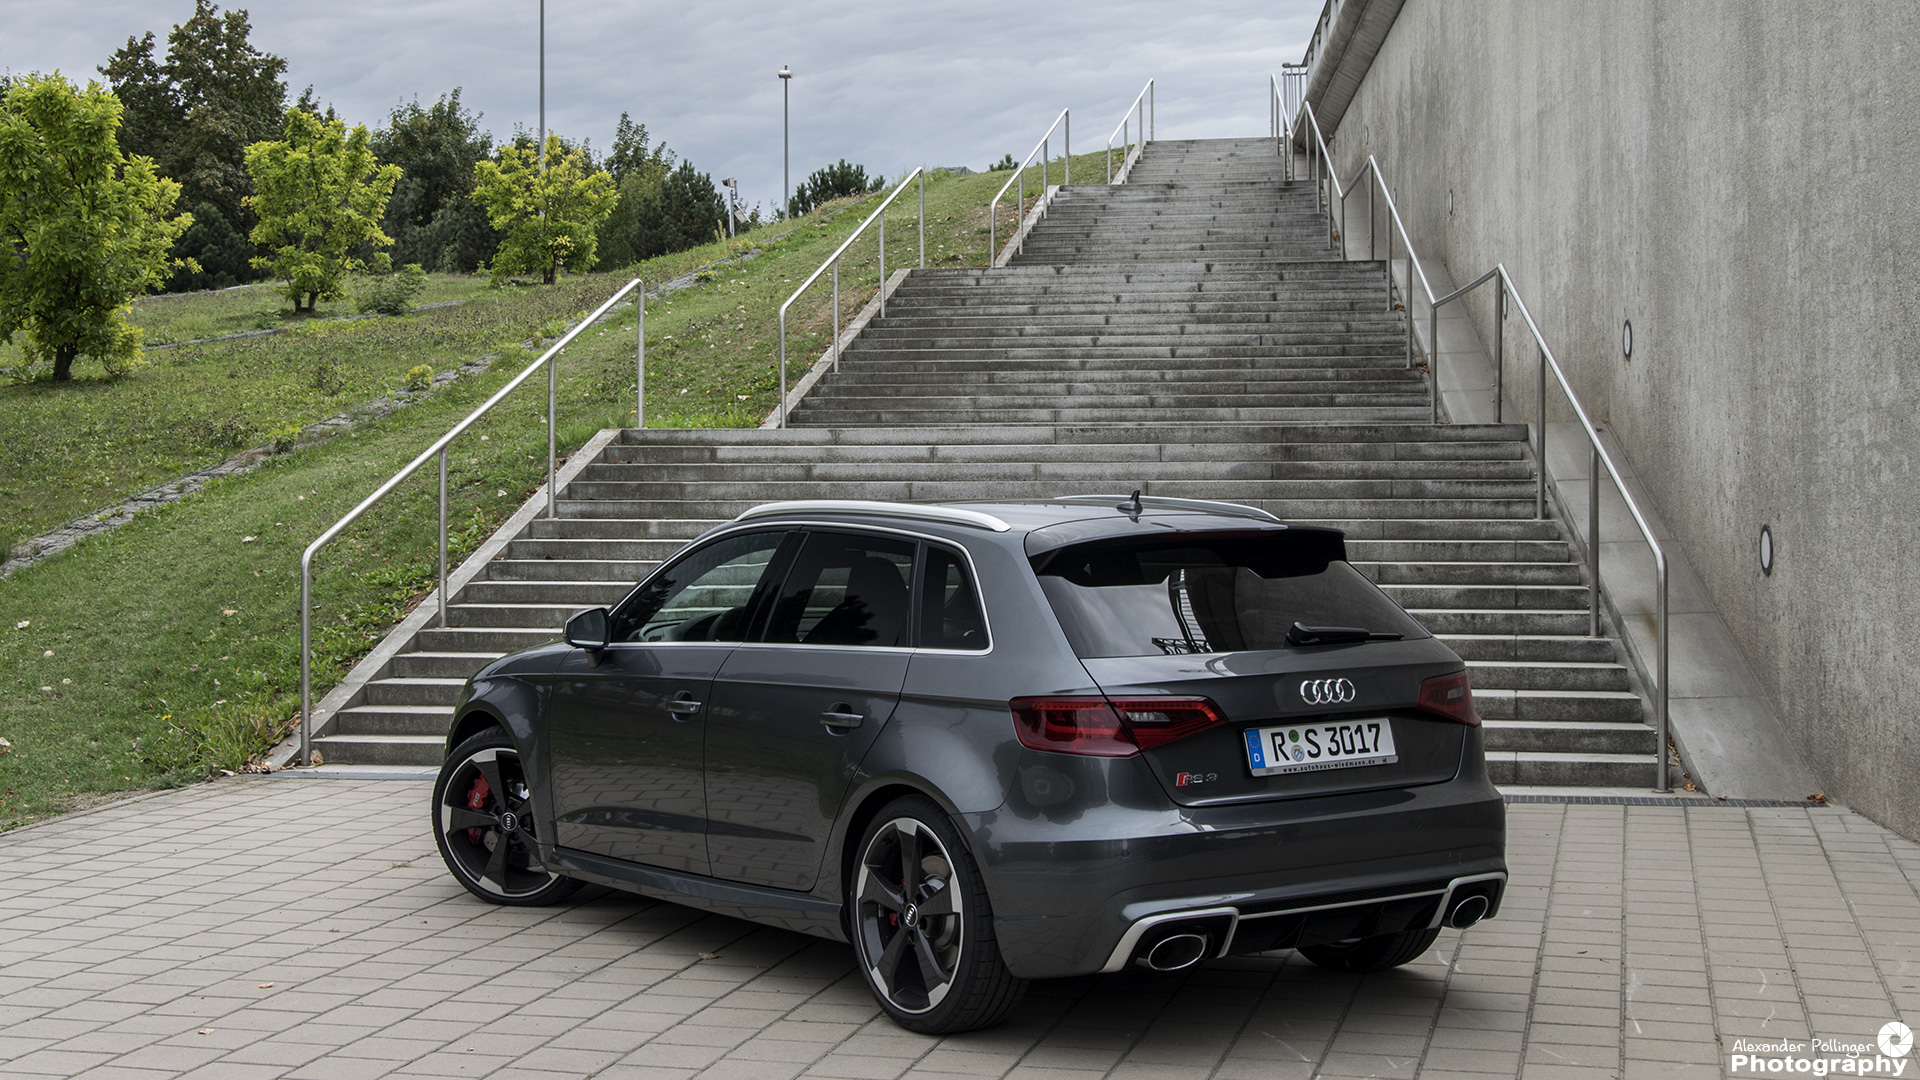 Audi Rs3 Daytonagrau Fotoshooting F 252 R Tts Freunde De